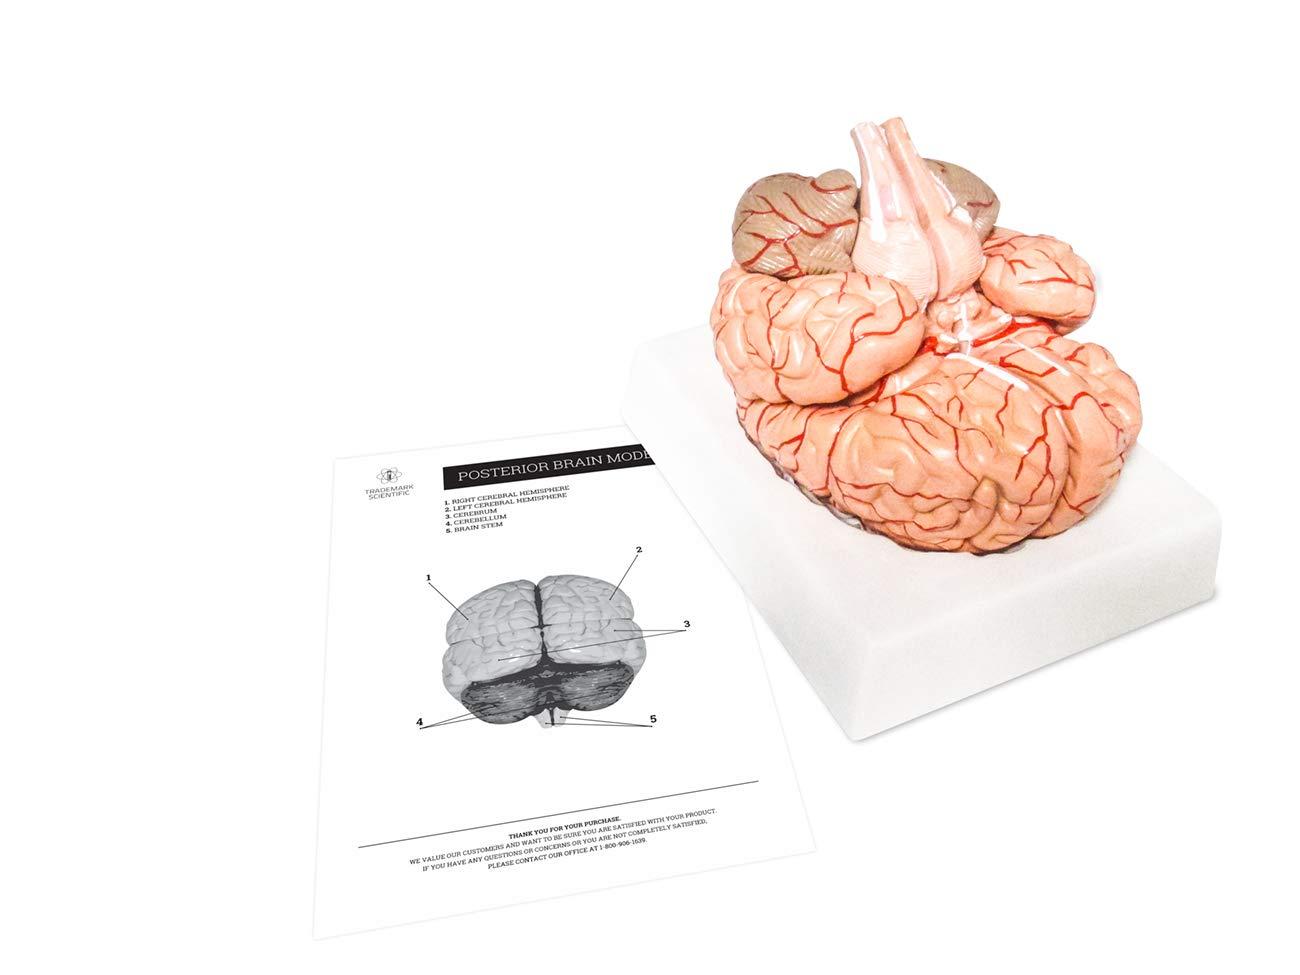 3D Anatomy Brain Model for Teaching by Trademark Scientific